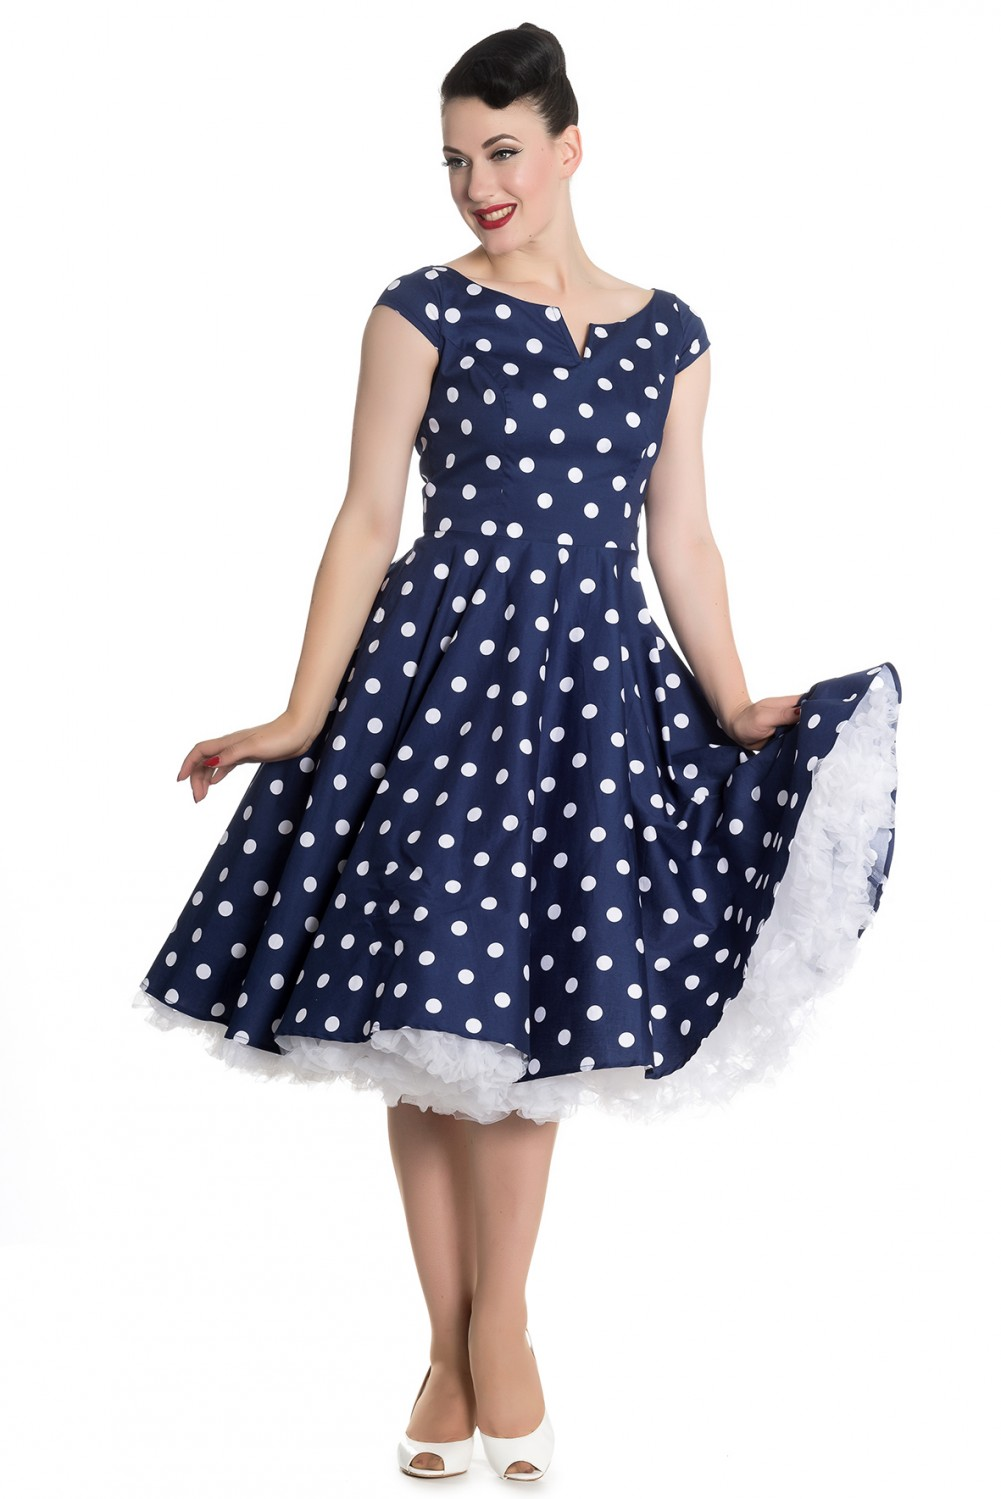 Nicky 50s Retro Polka Dots Petticoat Kleid V Hell Bunny Frauen Kleider